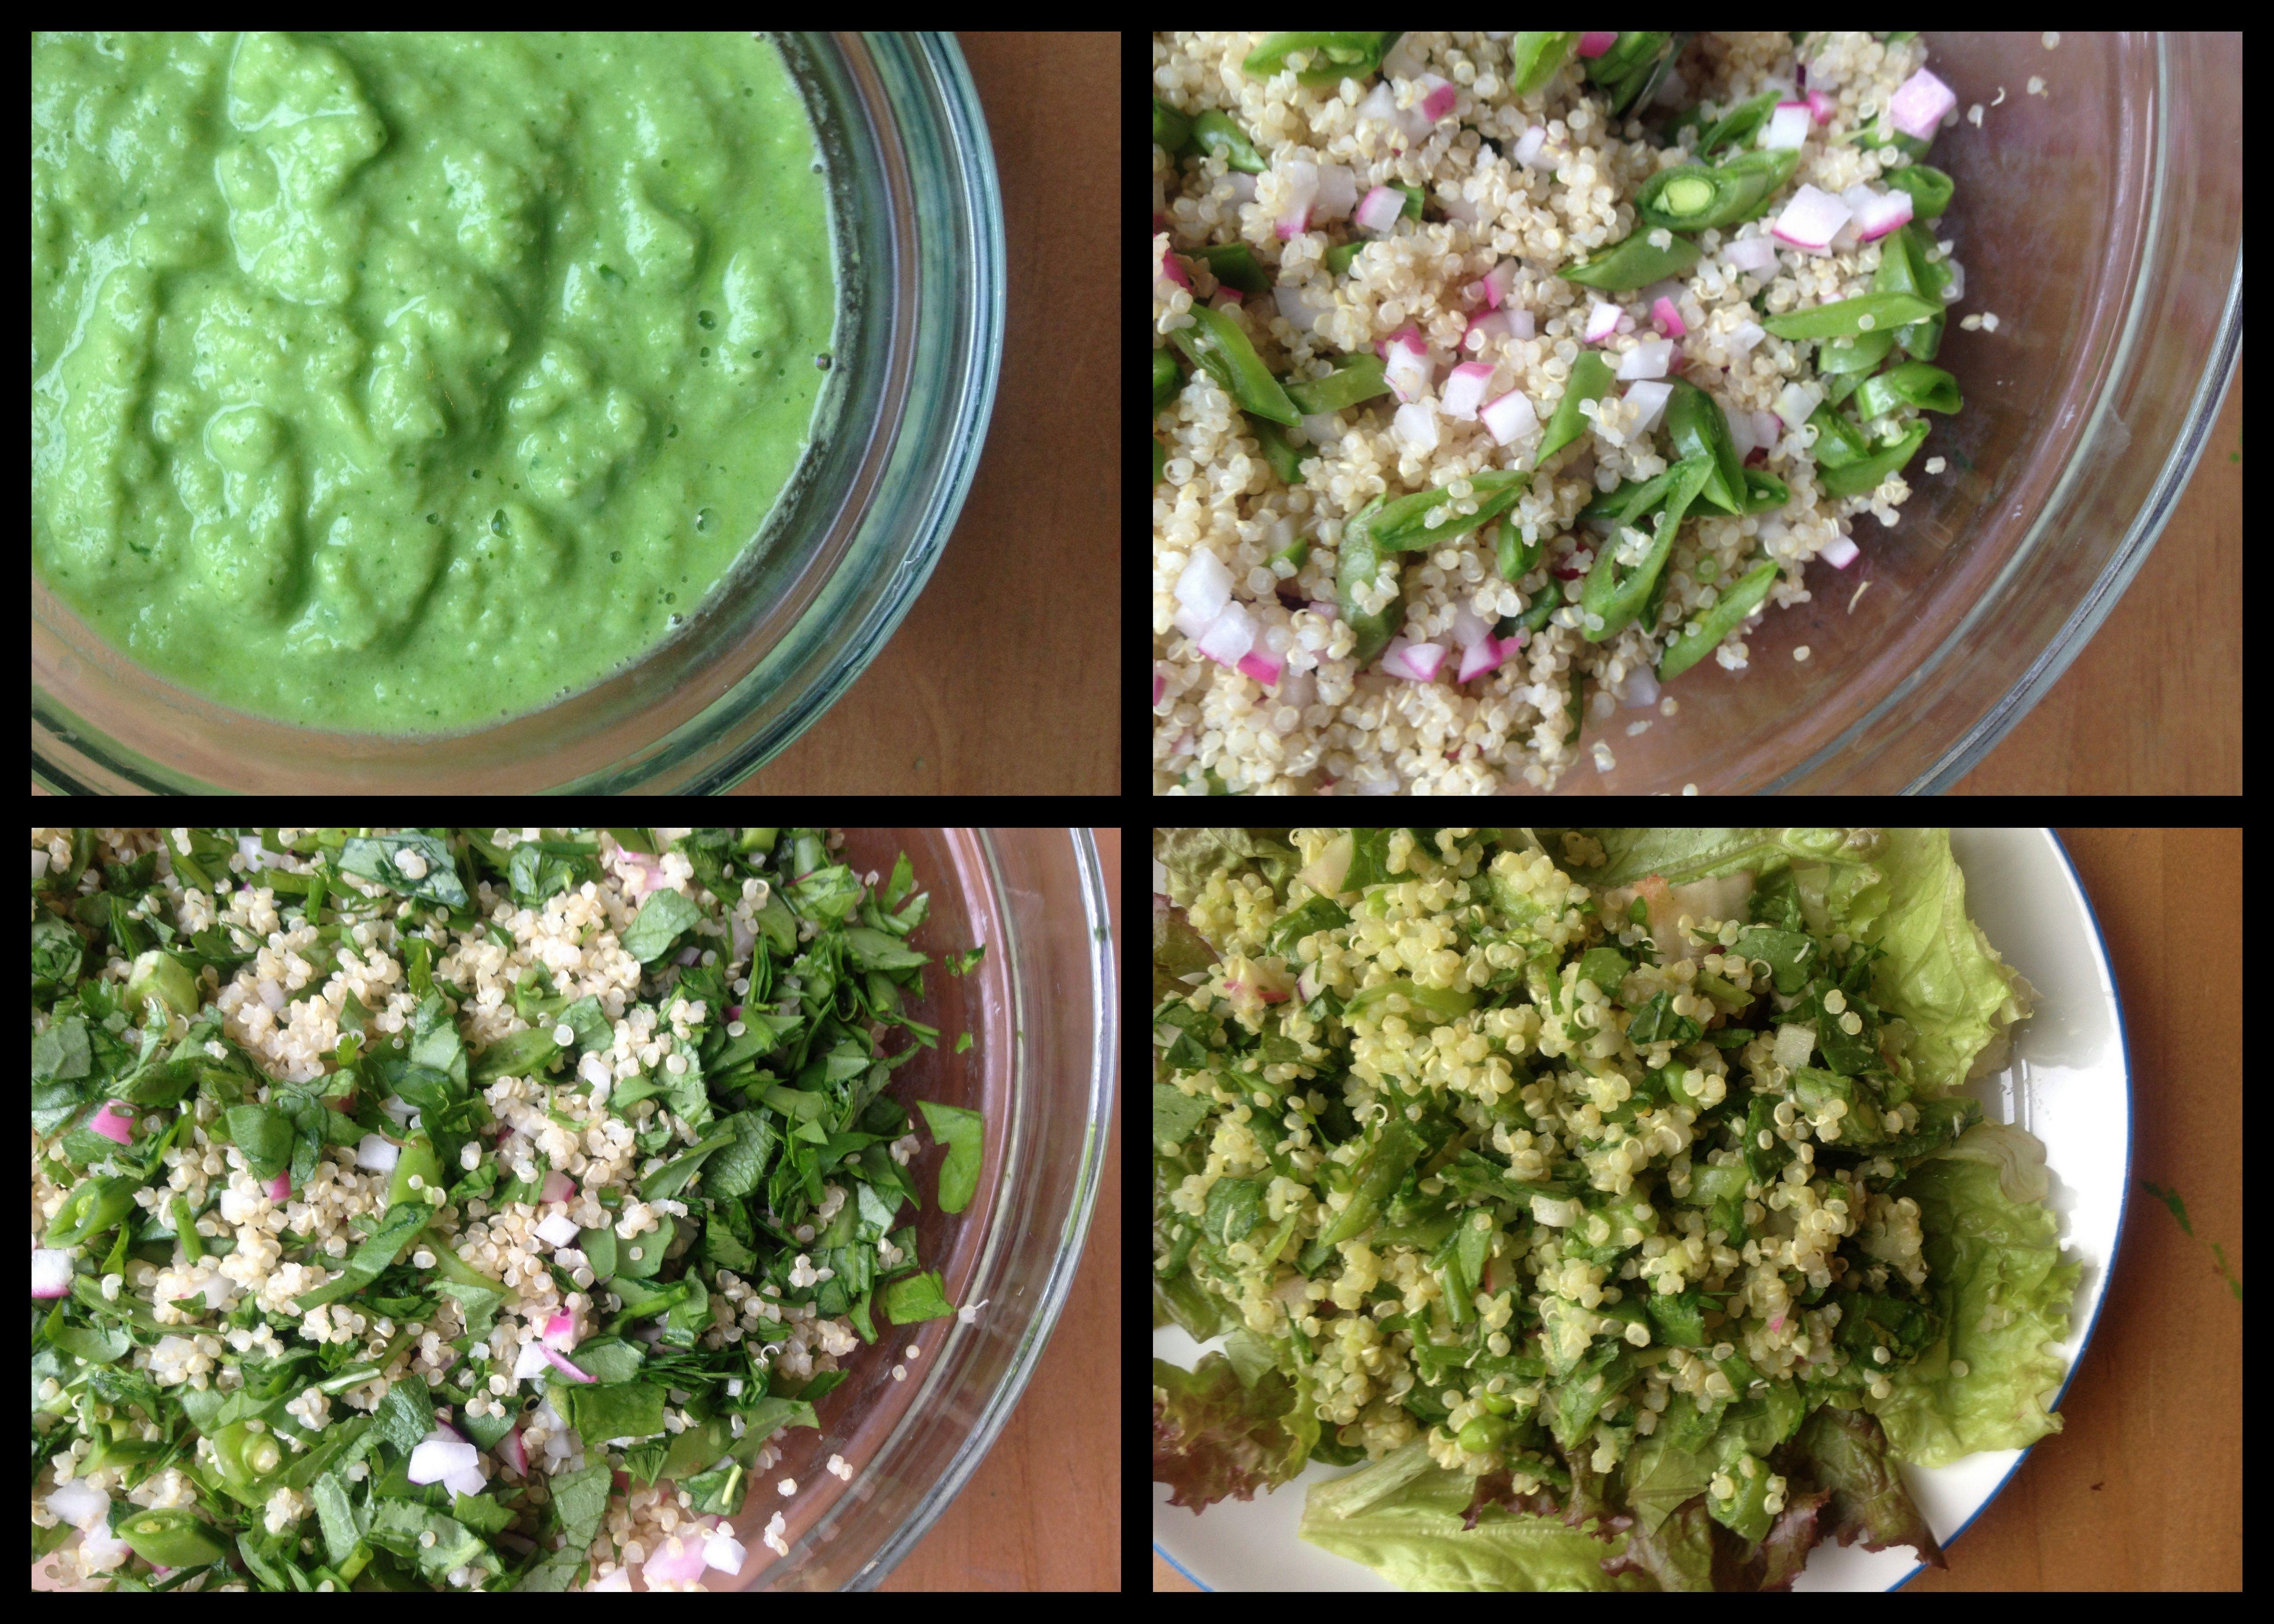 Quinoa Salad with Radishes, Peas, Arugula, and Cilantro-Sweet Corn Dressing